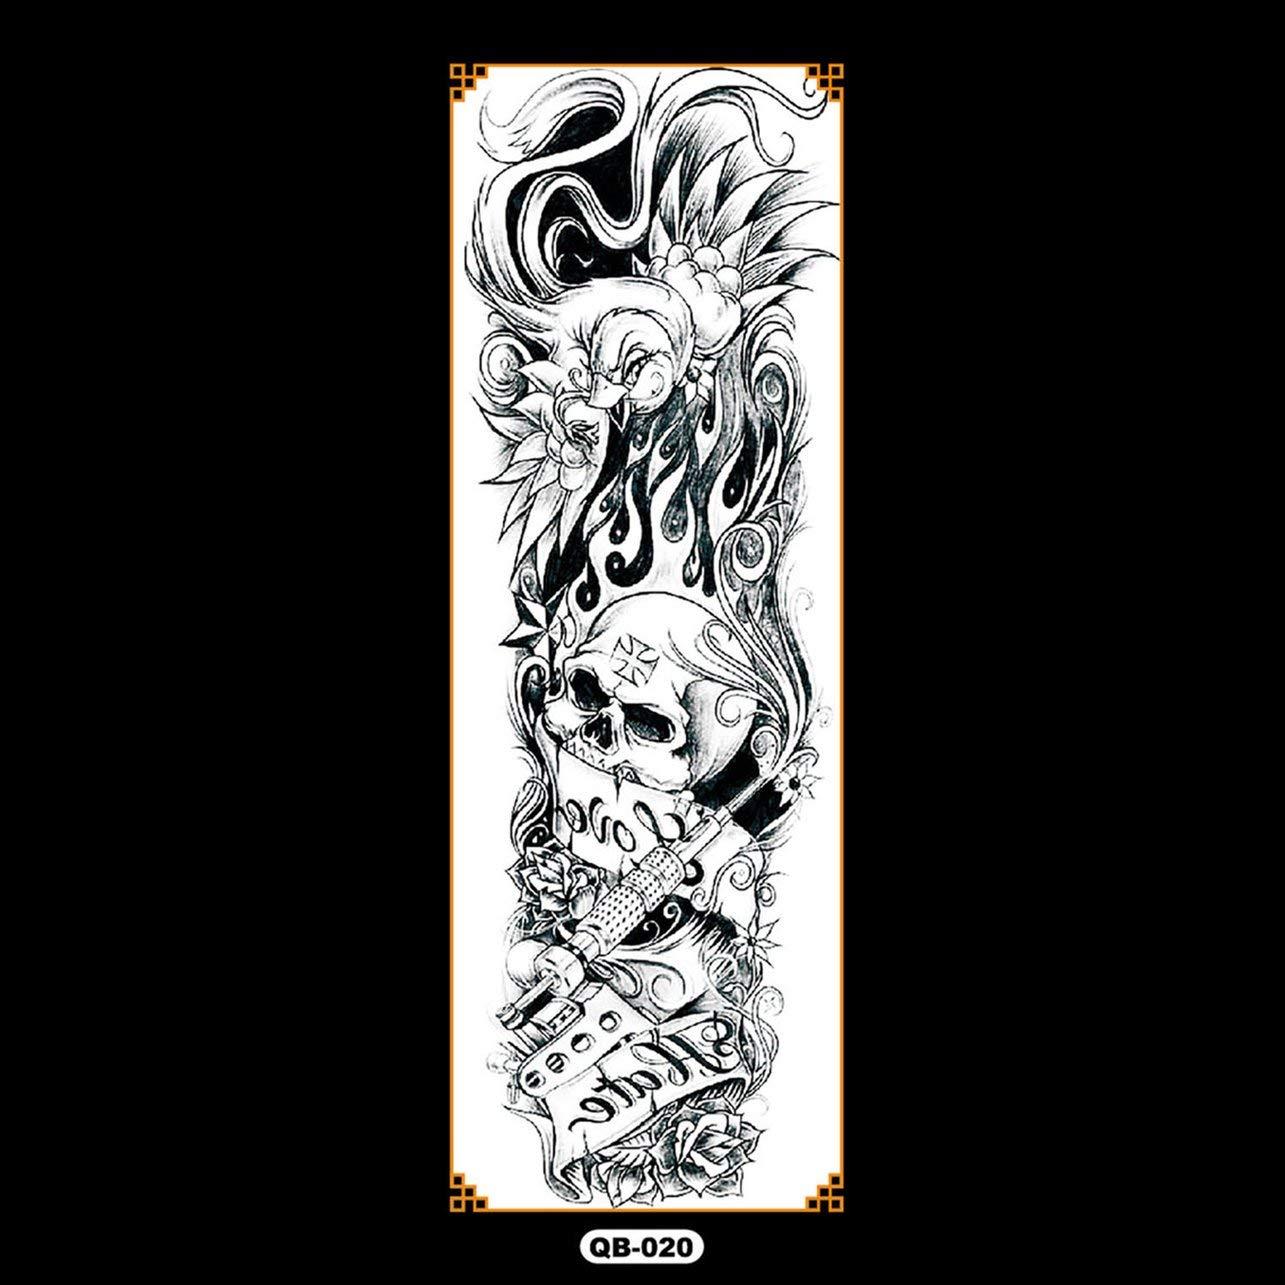 WOSOSYEYO QB Brazo Completo Etiqueta Engomada del Tatuaje de la Flor Impermeable Tatuaje Temporal Manga Hombres Mujeres Pintura Corporal Transferencia de Agua Falso Tatoo Manga